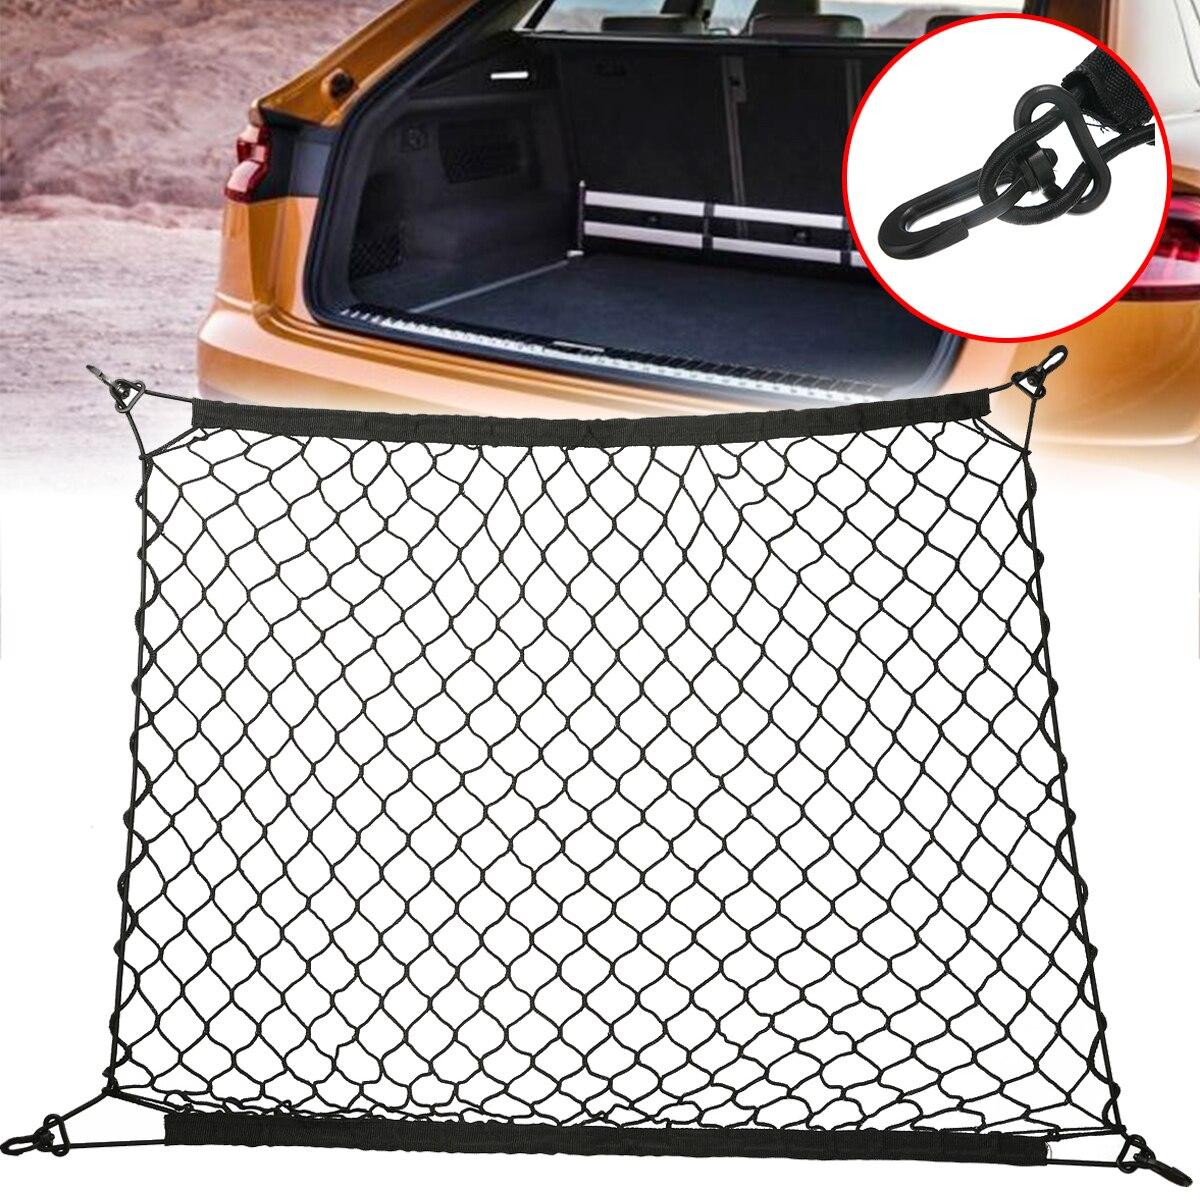 70cm*70cm Universal Car Trunk Luggage Storage Net can Stretch to 100cm Cargo Organizer Nets Elastic Mesh Net with 4 Hooks